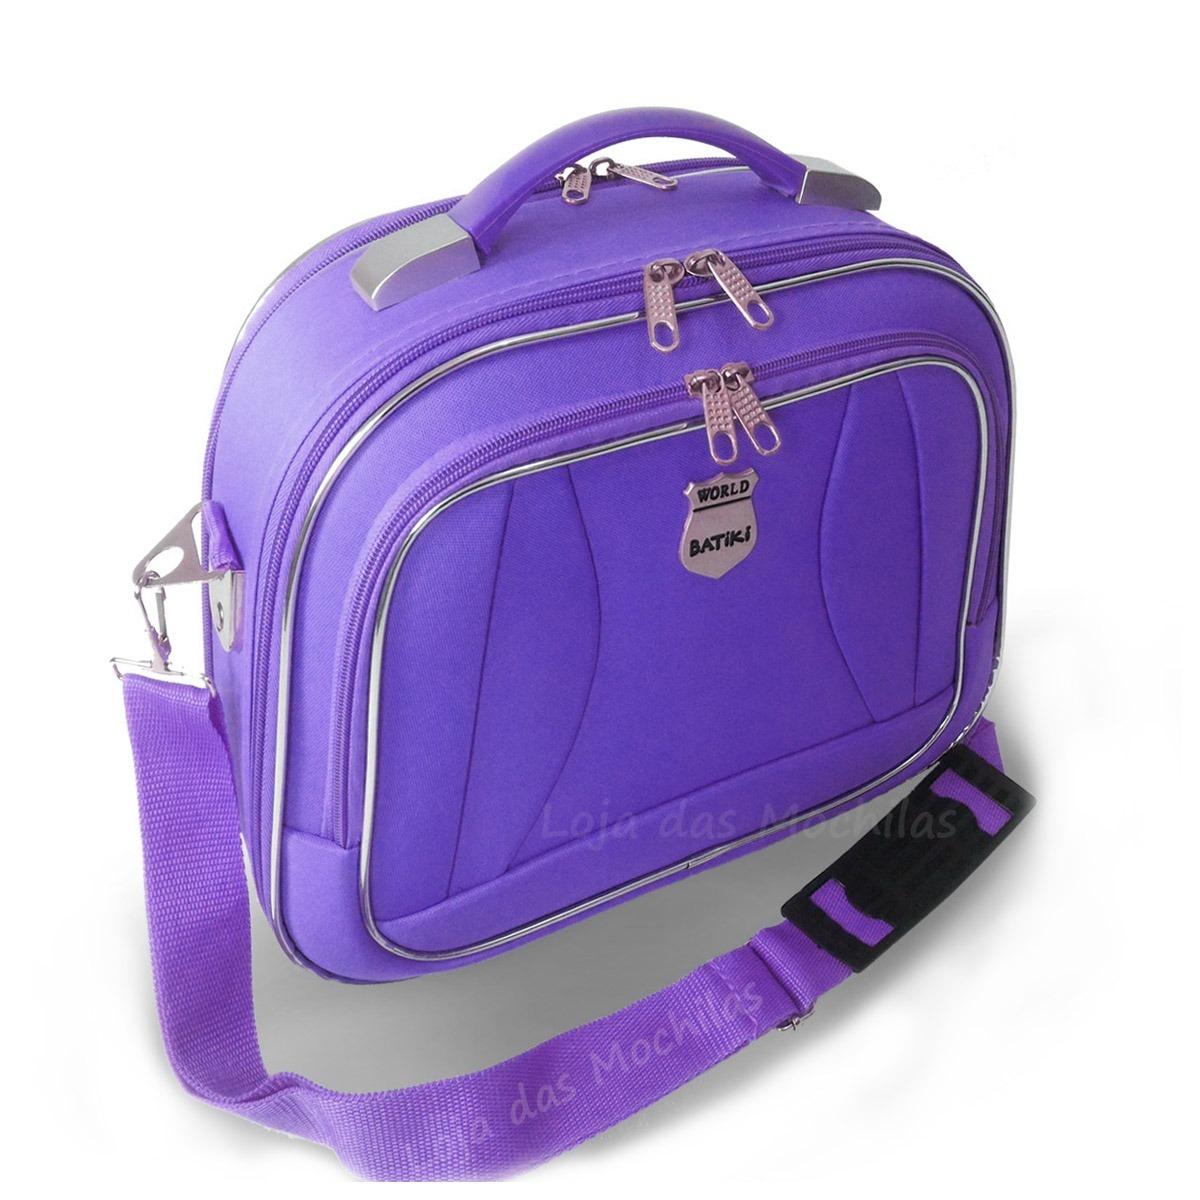 dd133dd33 frasqueira necessaire maleta maquiagem manicure 14 batiki. Carregando zoom.